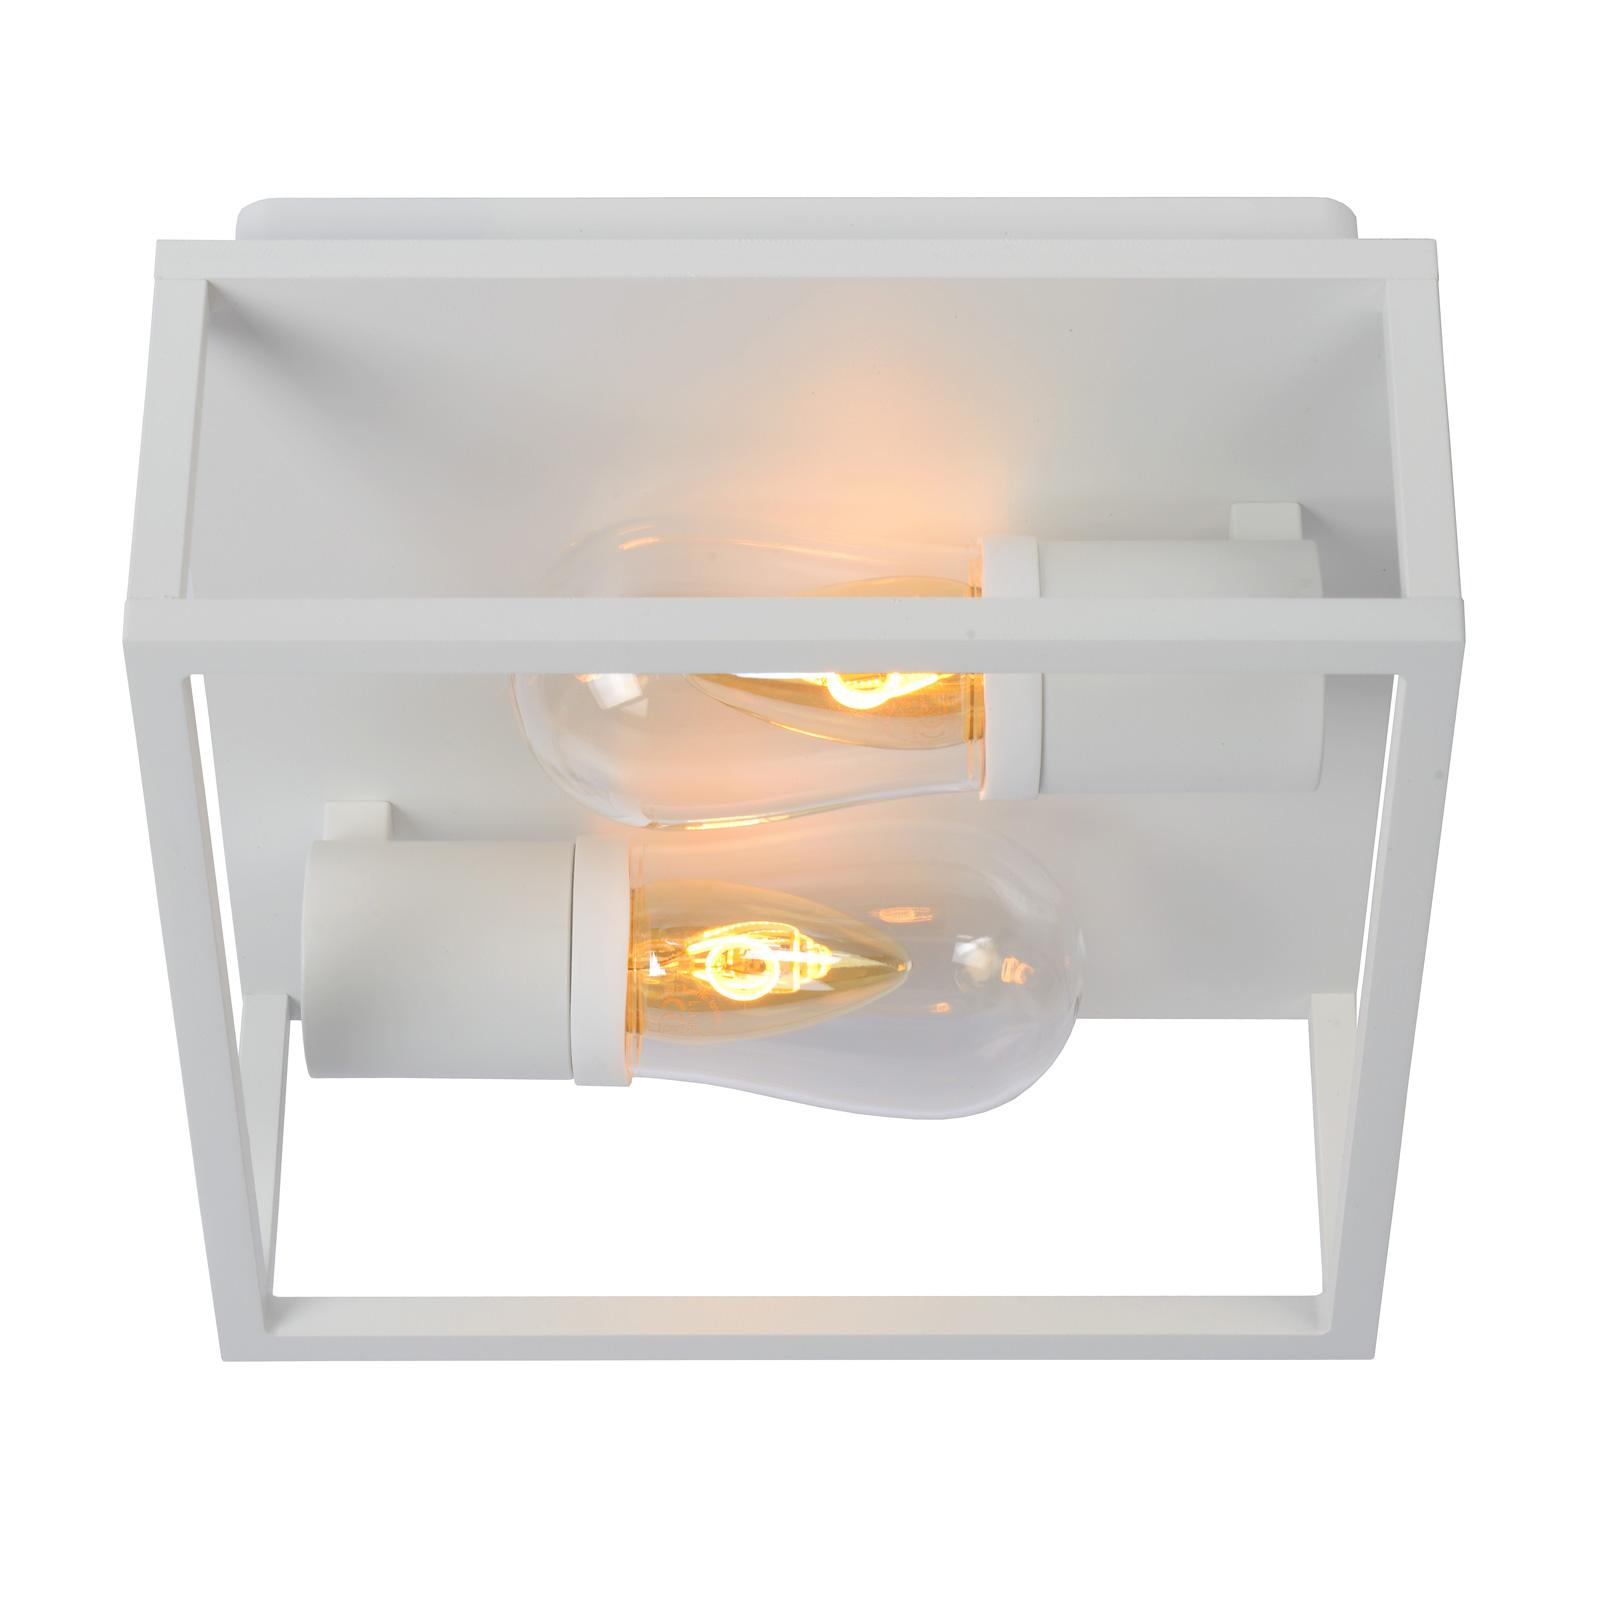 Lámpara de techo Carlyn, baño, 2 luces, blanco